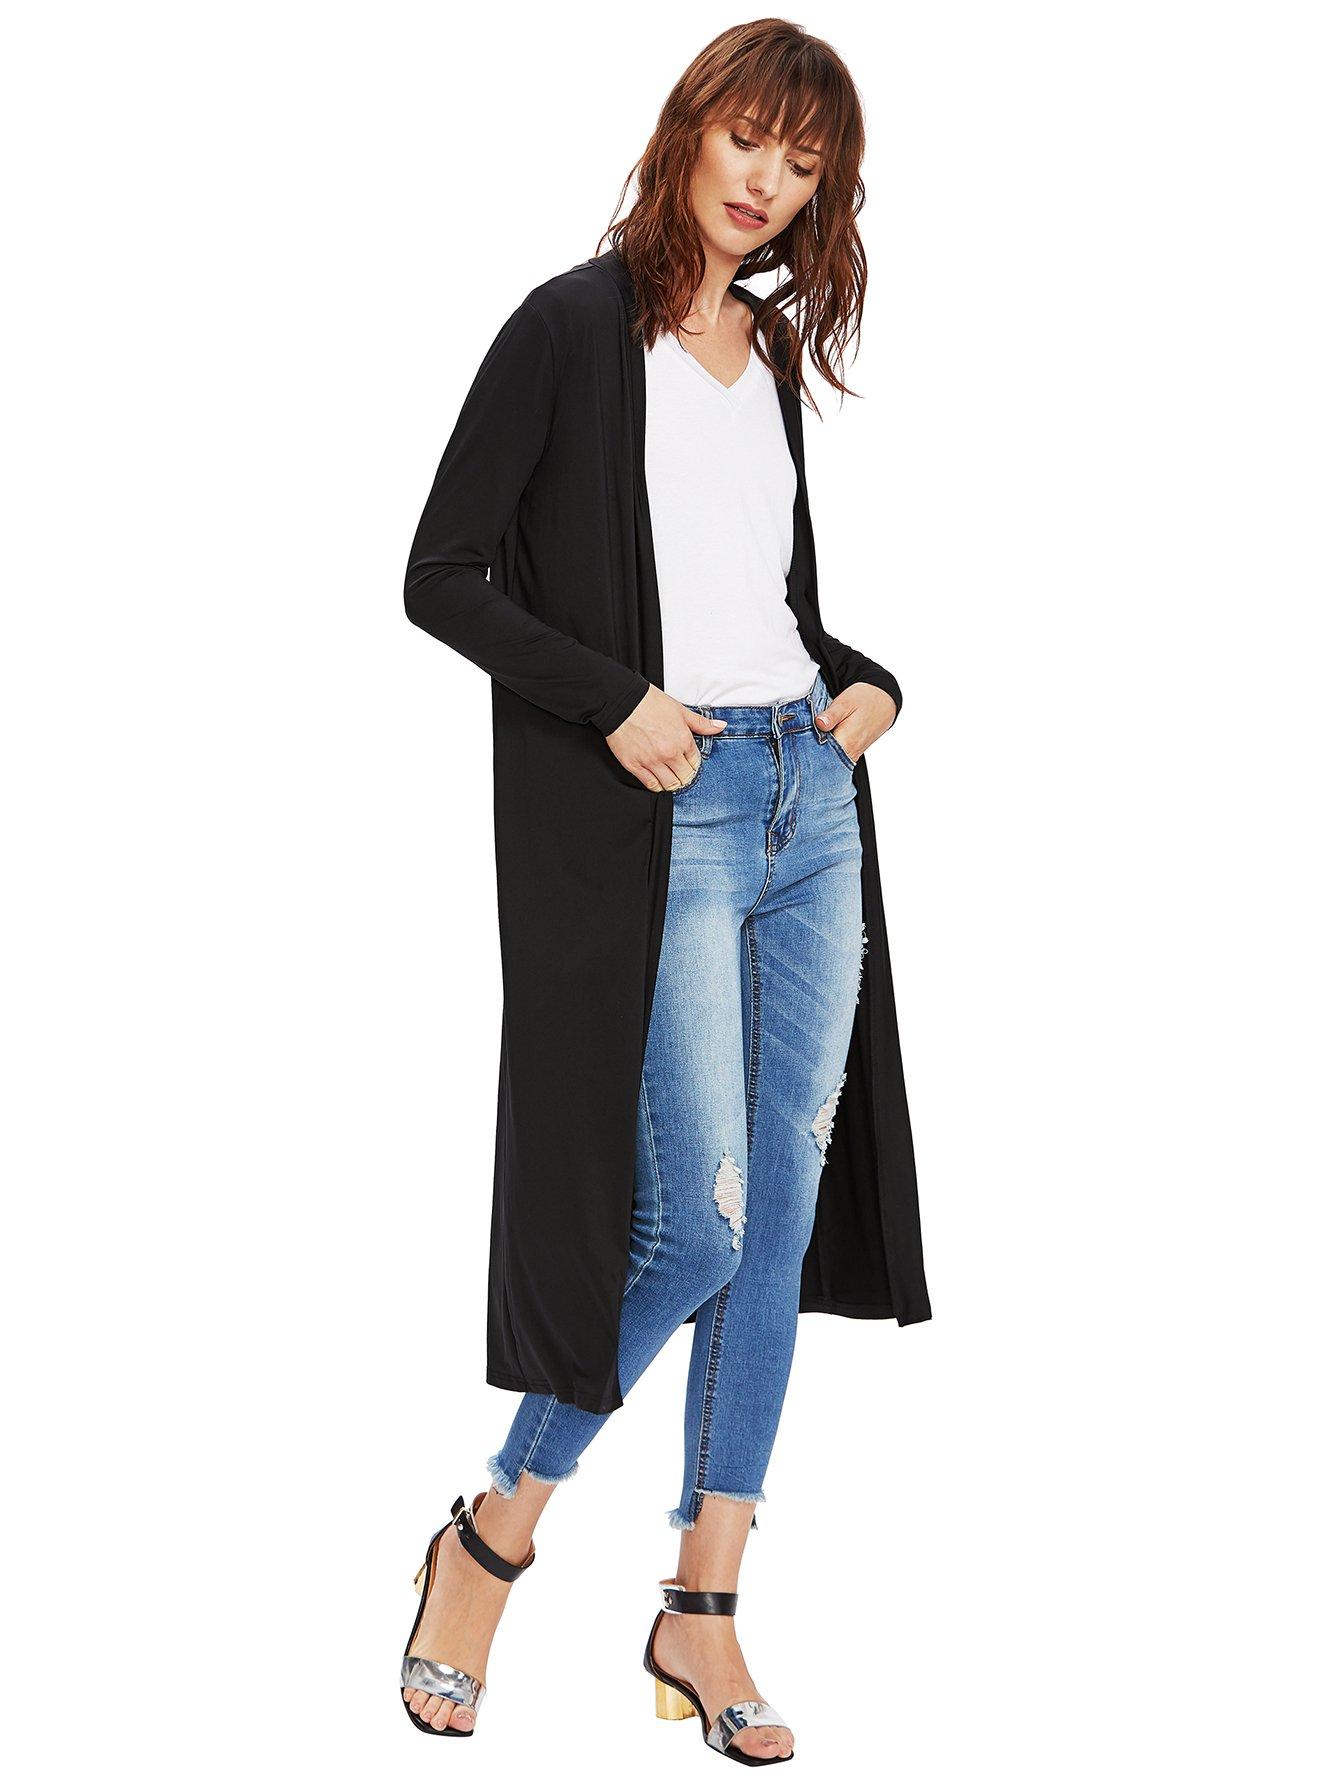 Verdusa Women's Long Sleeve Open Front Long Maxi Cardigan Longline Duster Coat Black M by Verdusa (Image #2)